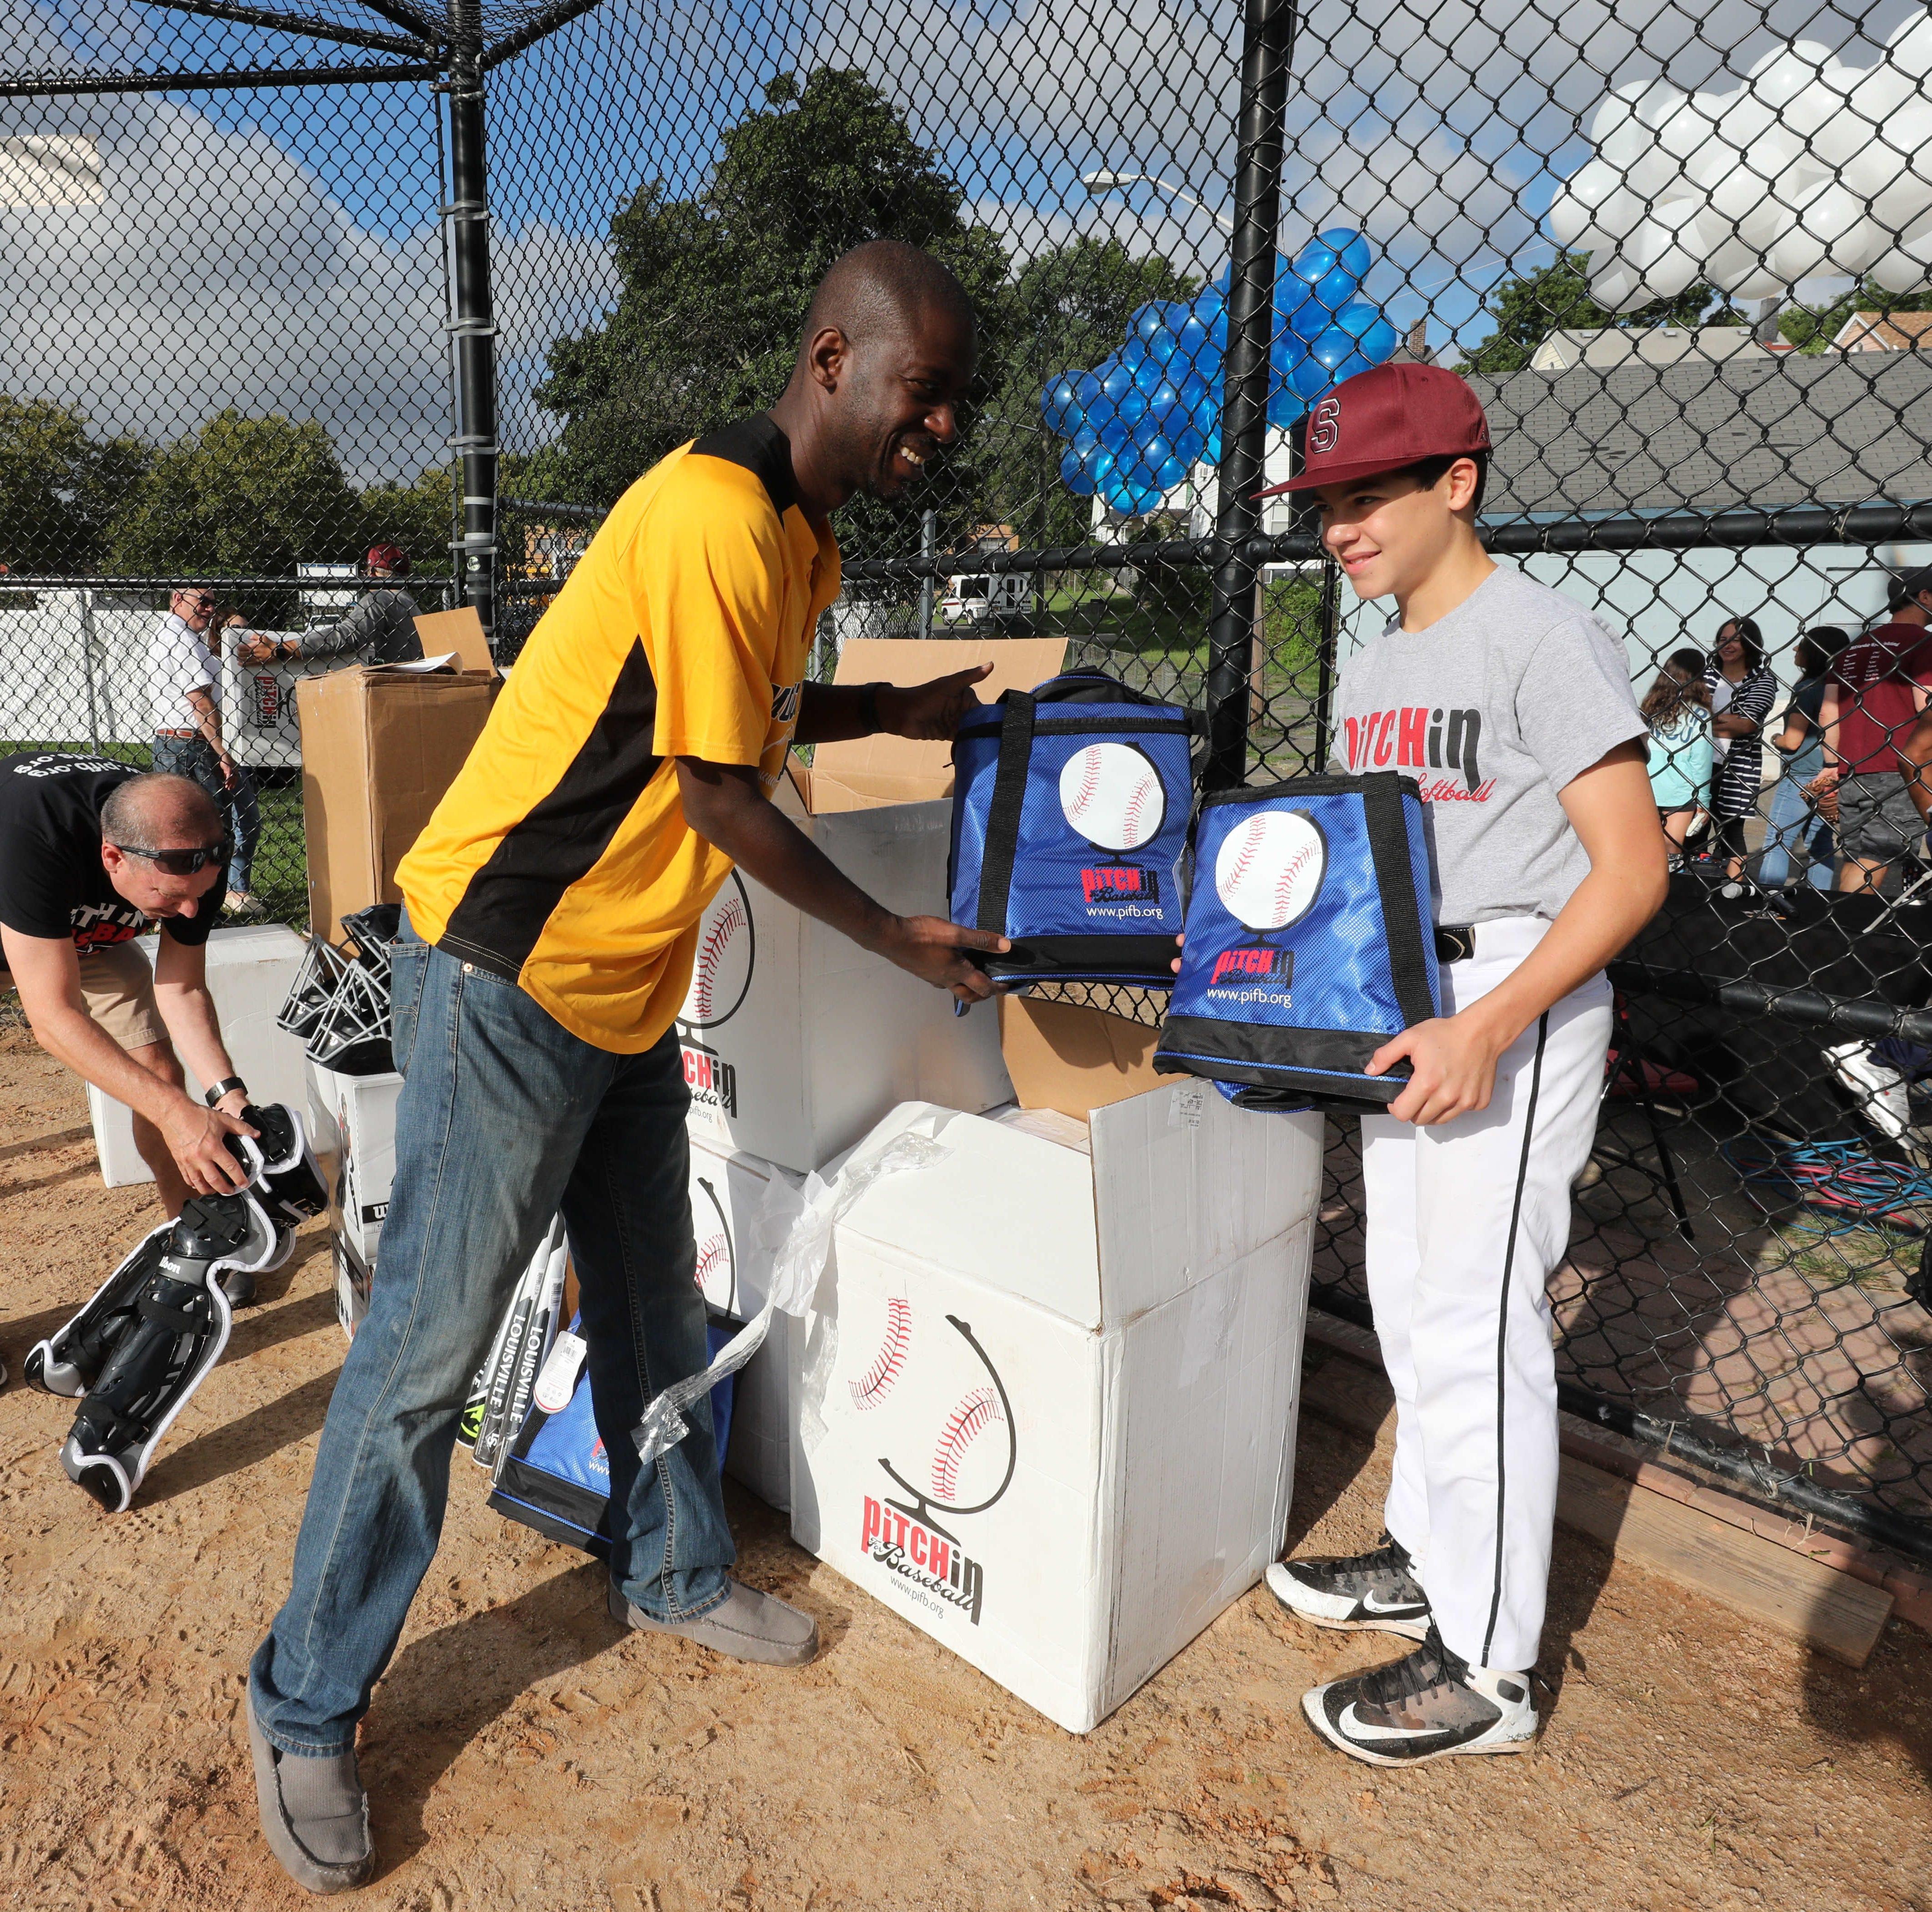 Scarsdale boy donates $20,000 in baseball gear to Mount Vernon little league